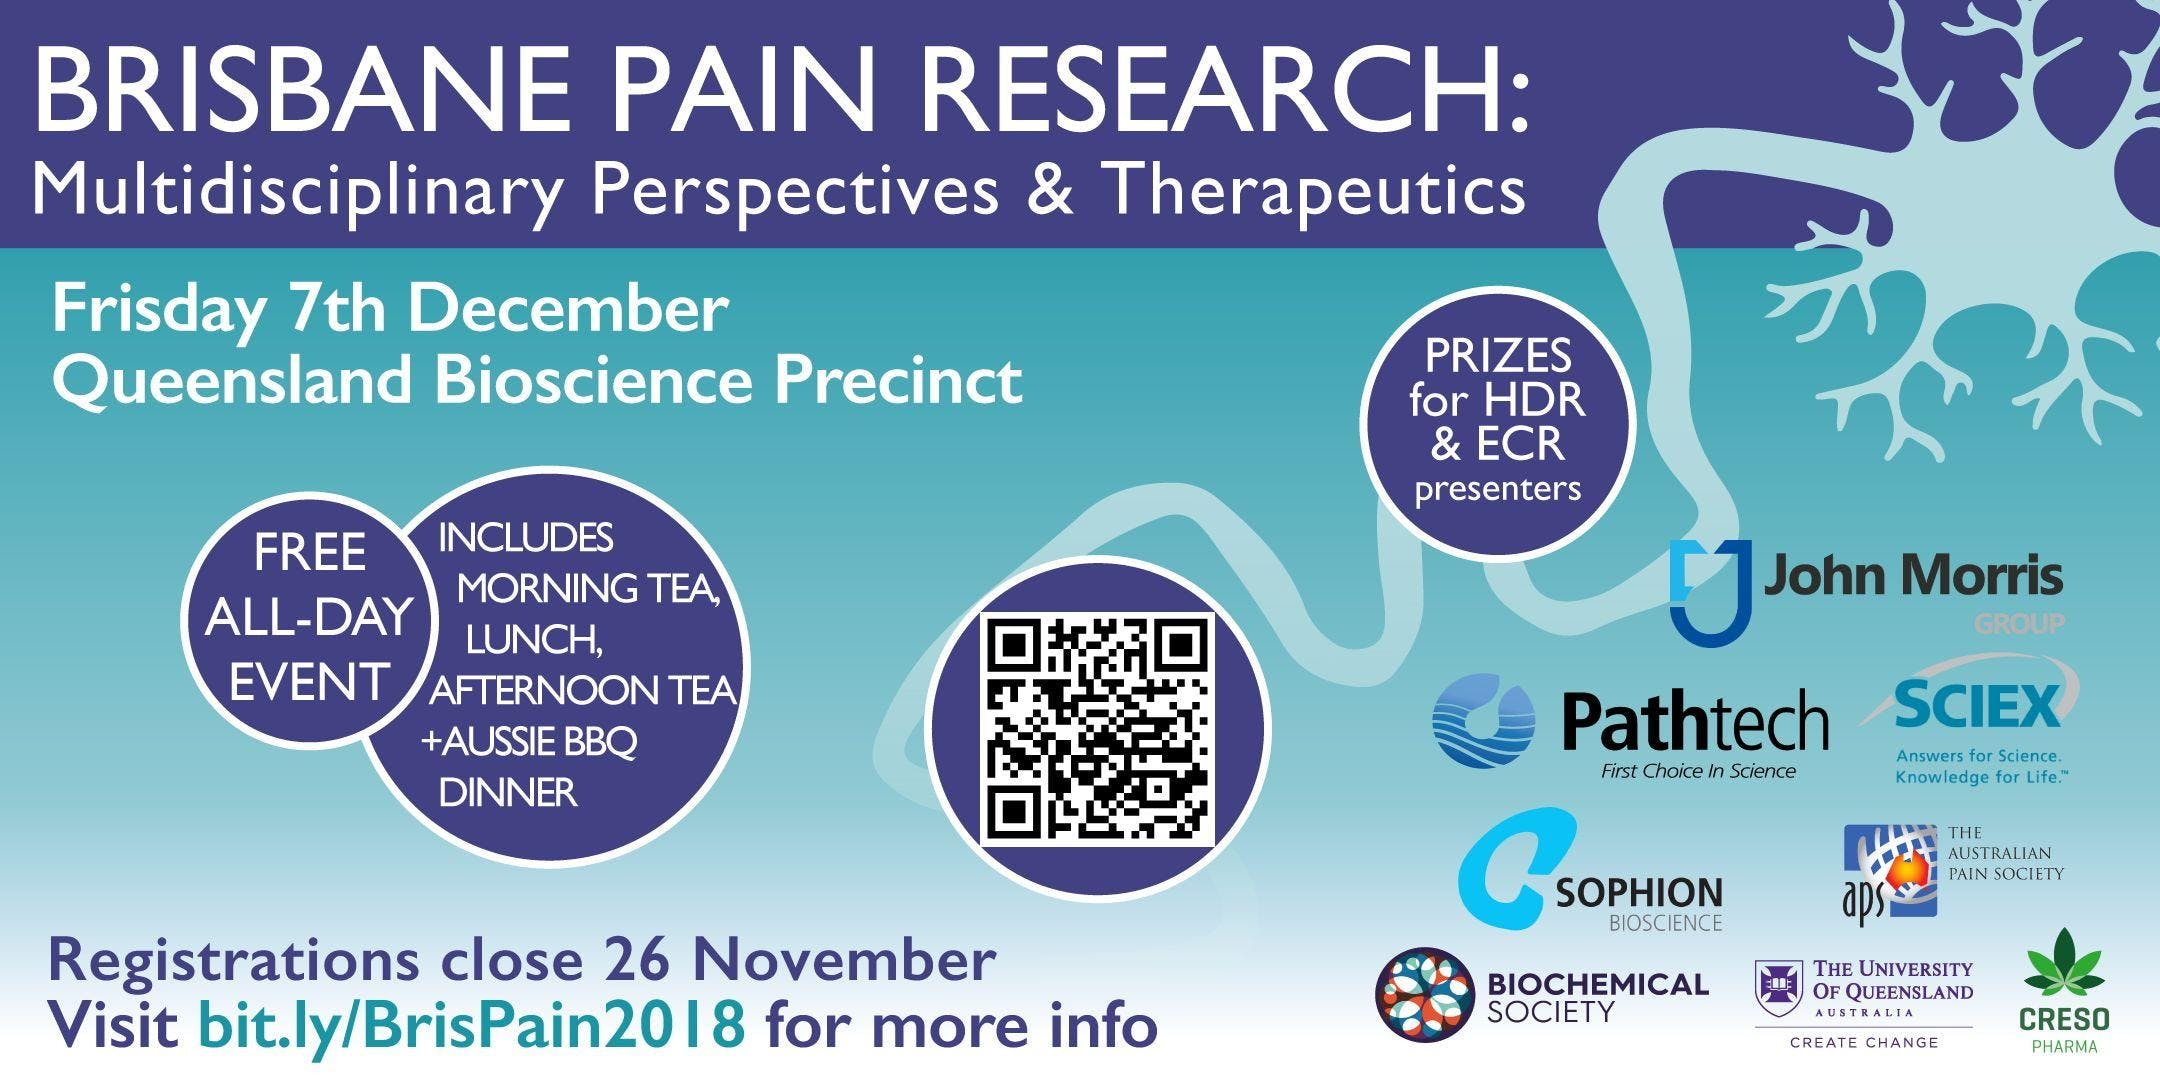 Brisbane Pain Research: Multidisciplinary Perspectives & Therapeutics